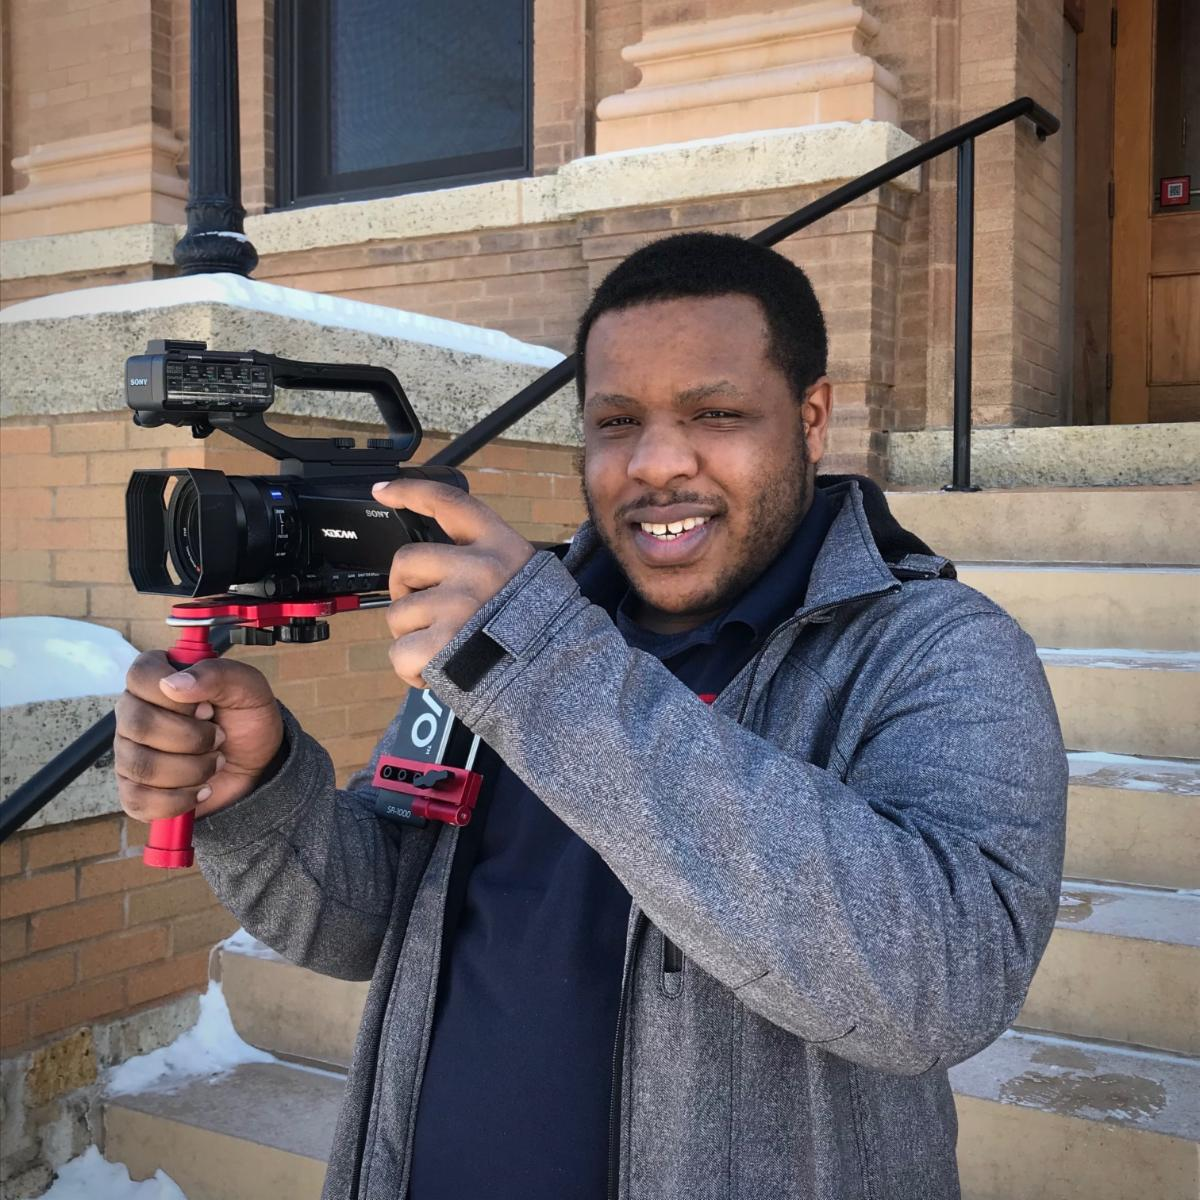 Photo of Macio outside City Hall holding a camera